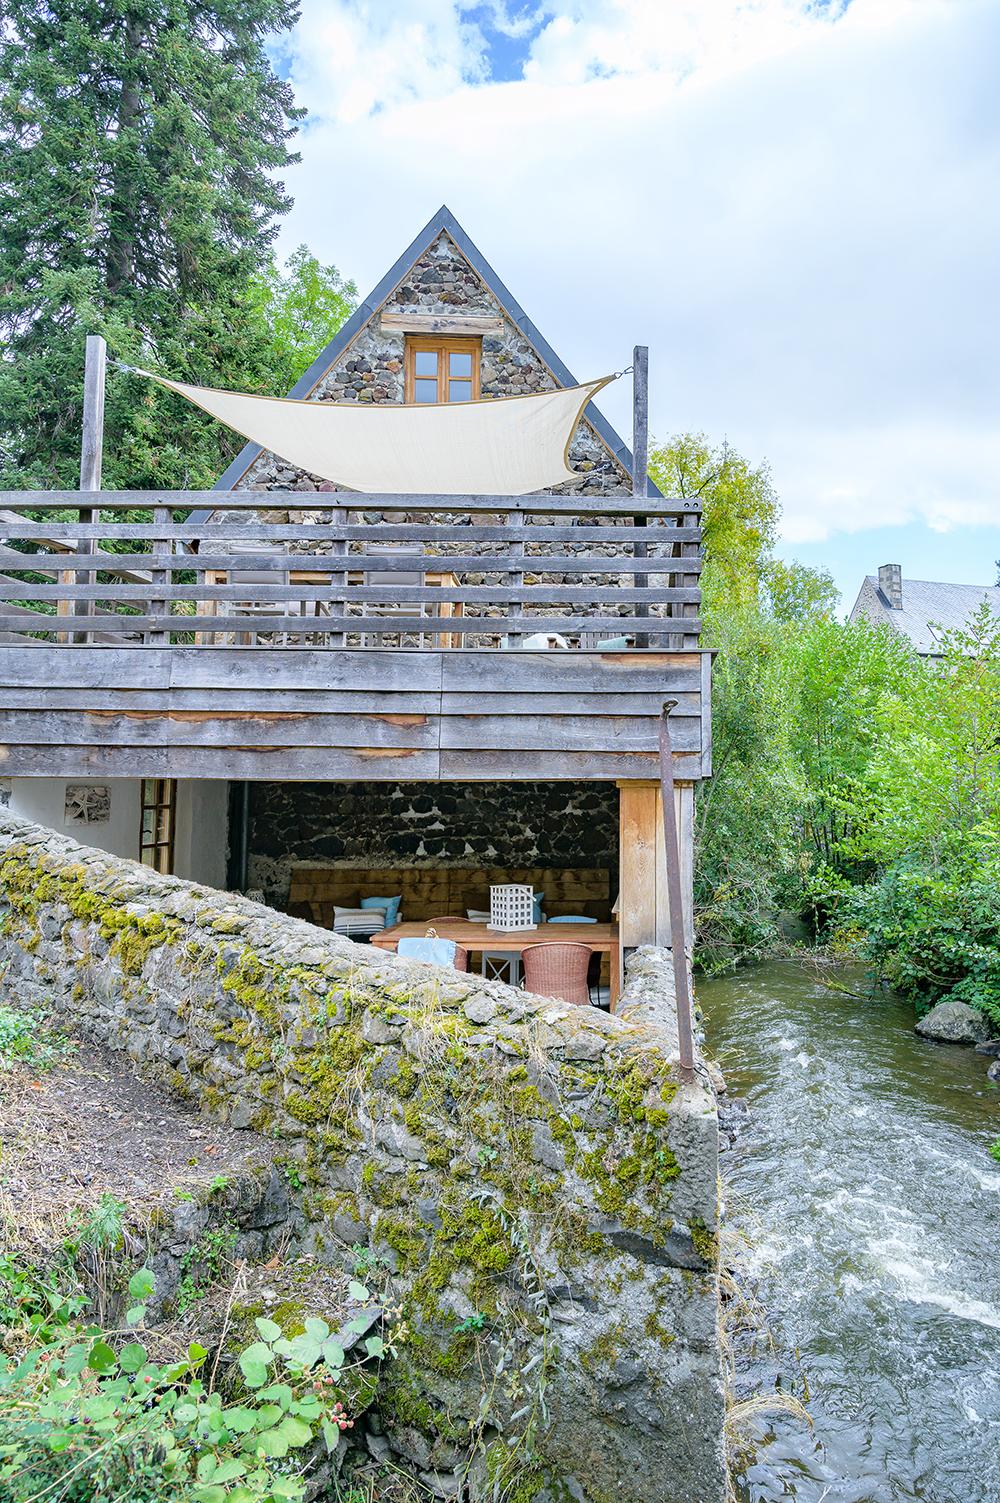 Overdekte loungeplek prive terras vakantiehuis Murol Puy-de-Dôme